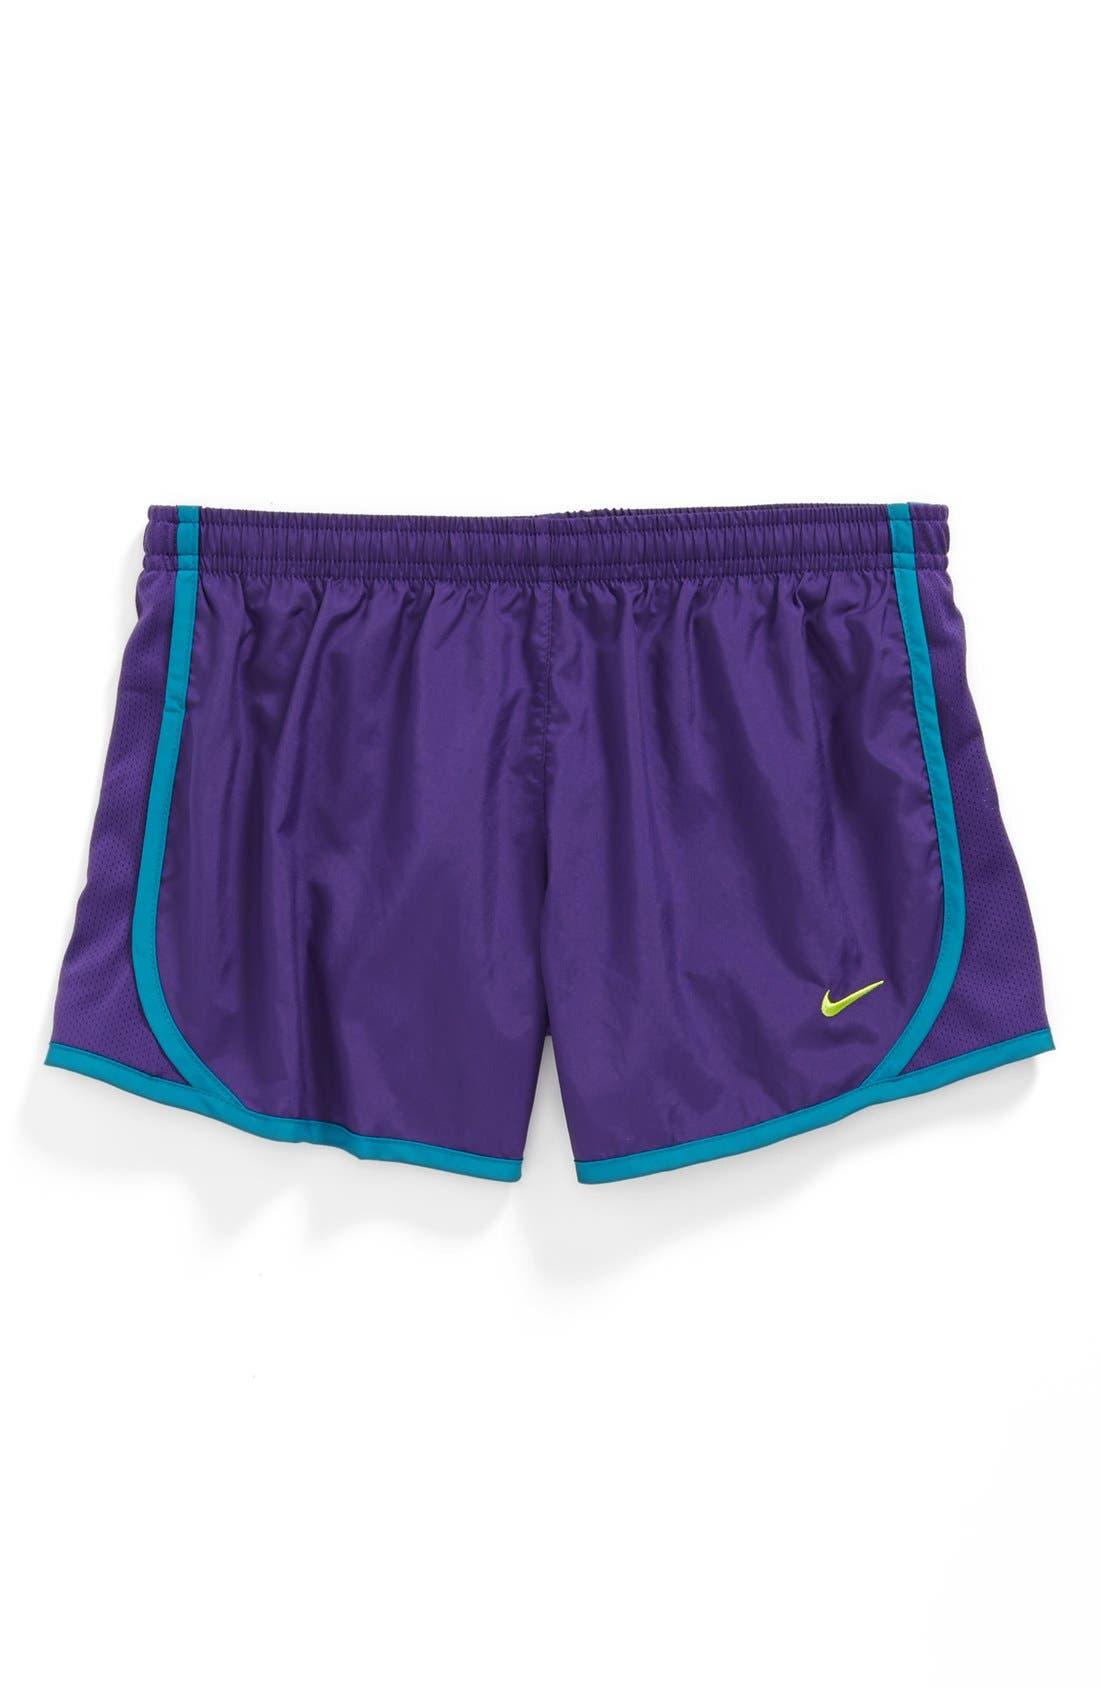 Main Image - Nike 'Tempo' Track Shorts (Little Girls & Big Girls)